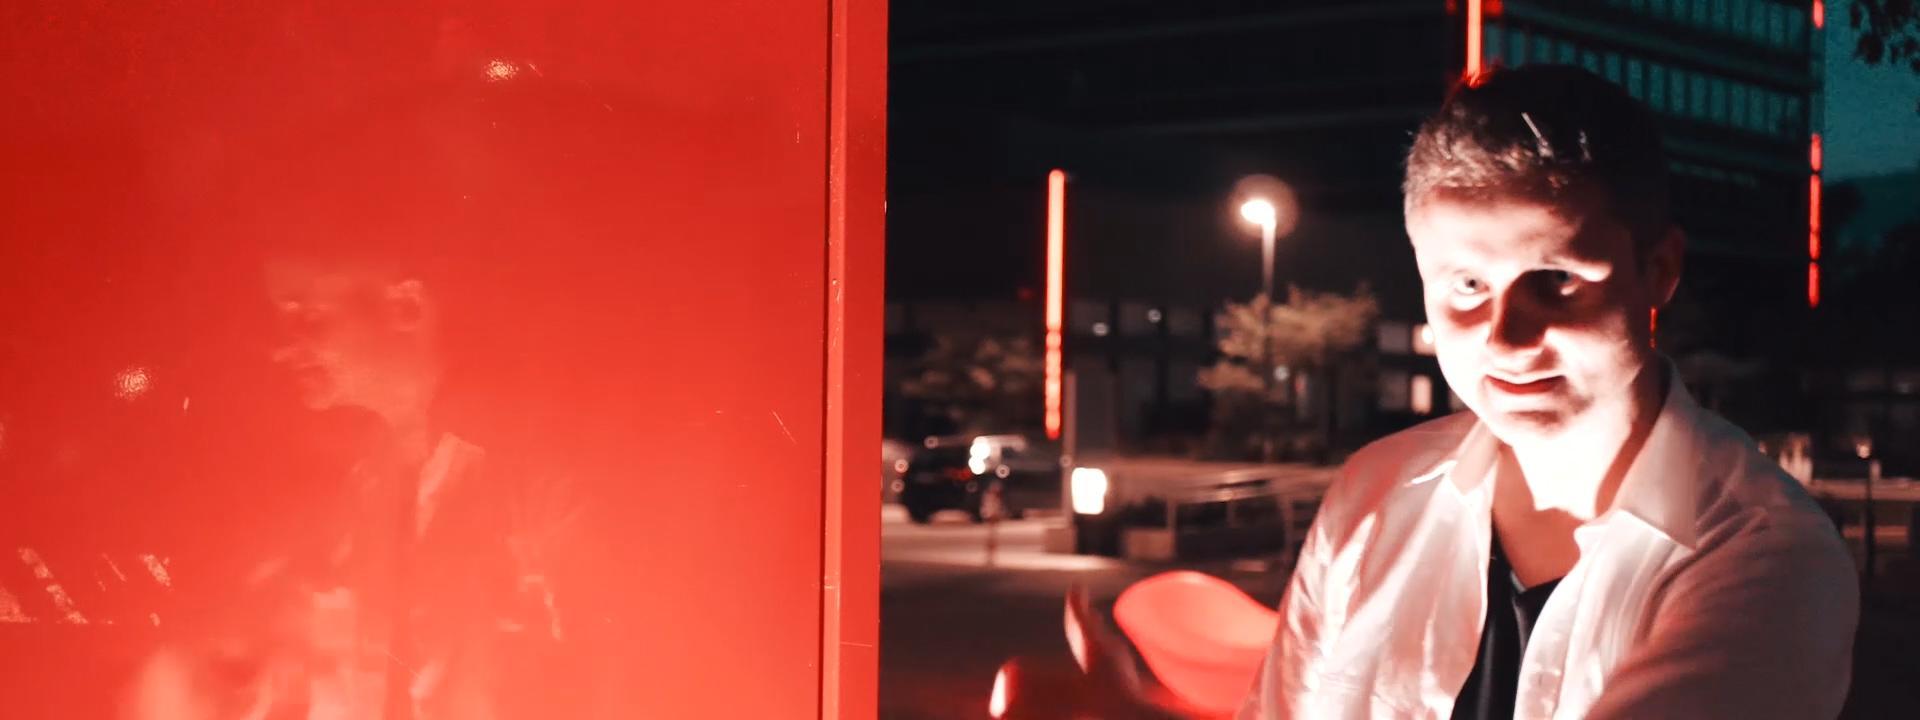 Blazin'Daniel - Nadine (Official Video) 60fps.00_02_46_27.Standbild031